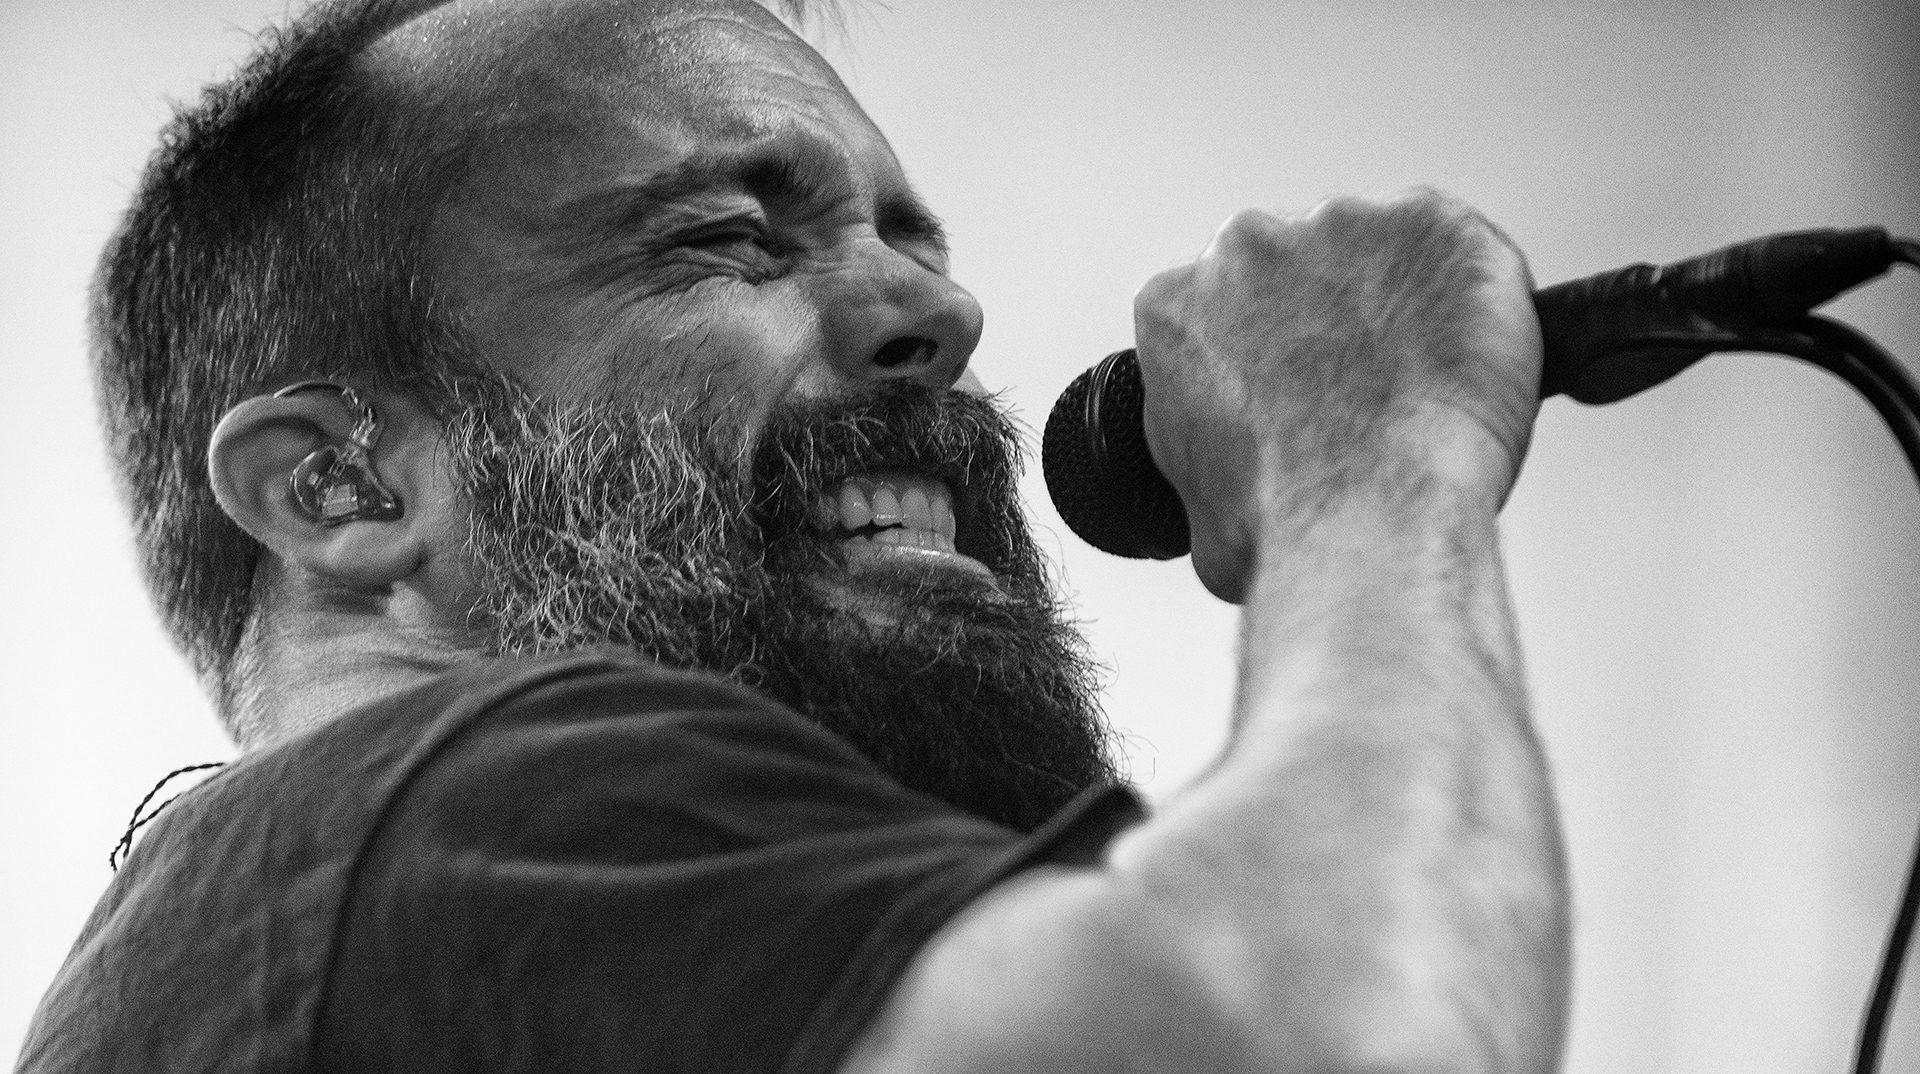 Neil Fallon, Clutch band, vocalist, Tuska metal festival, blues